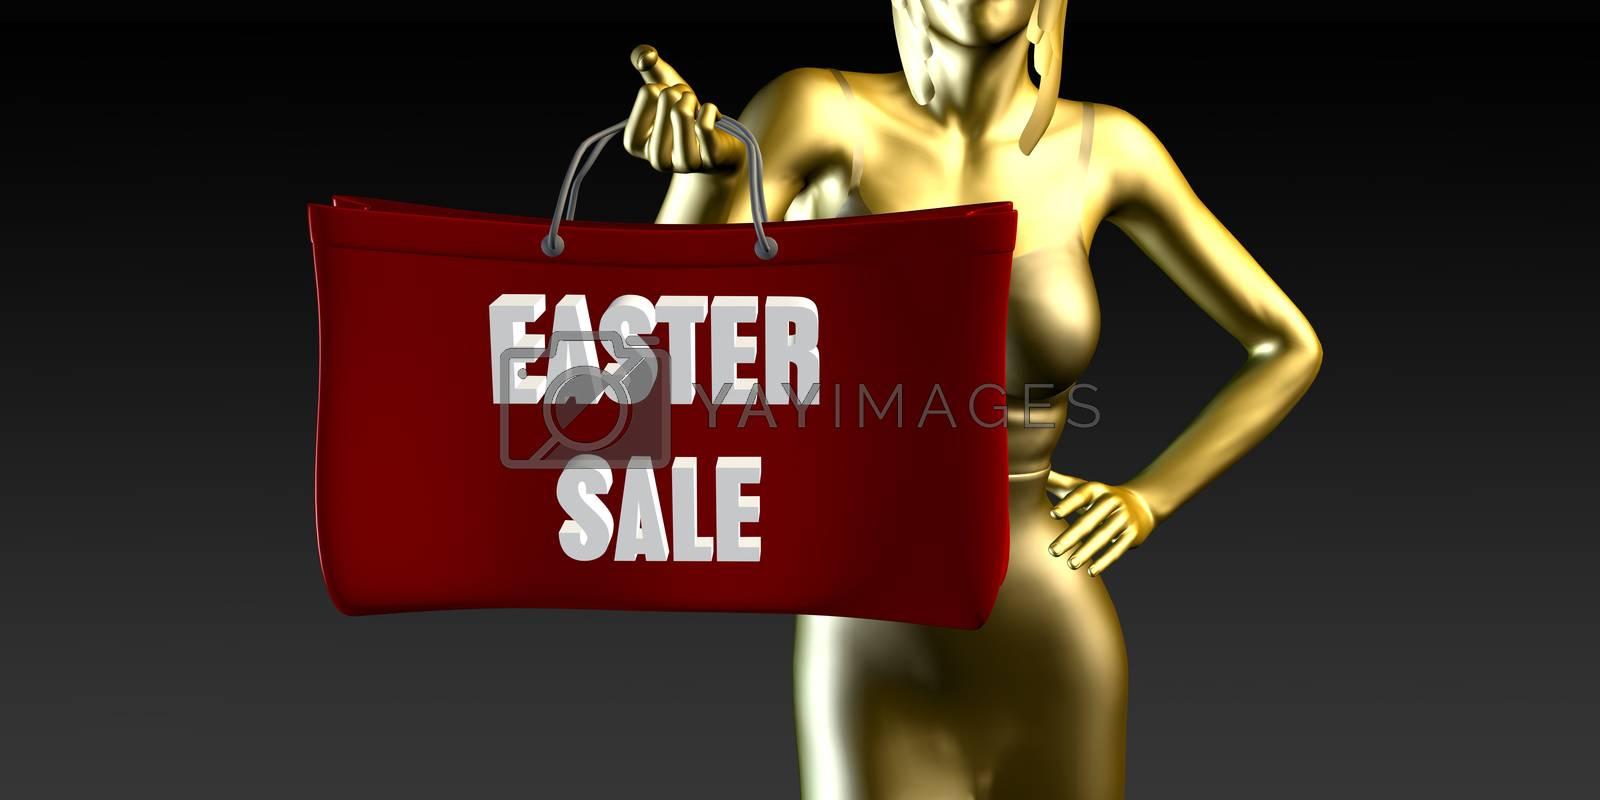 Easter Sale by kentoh